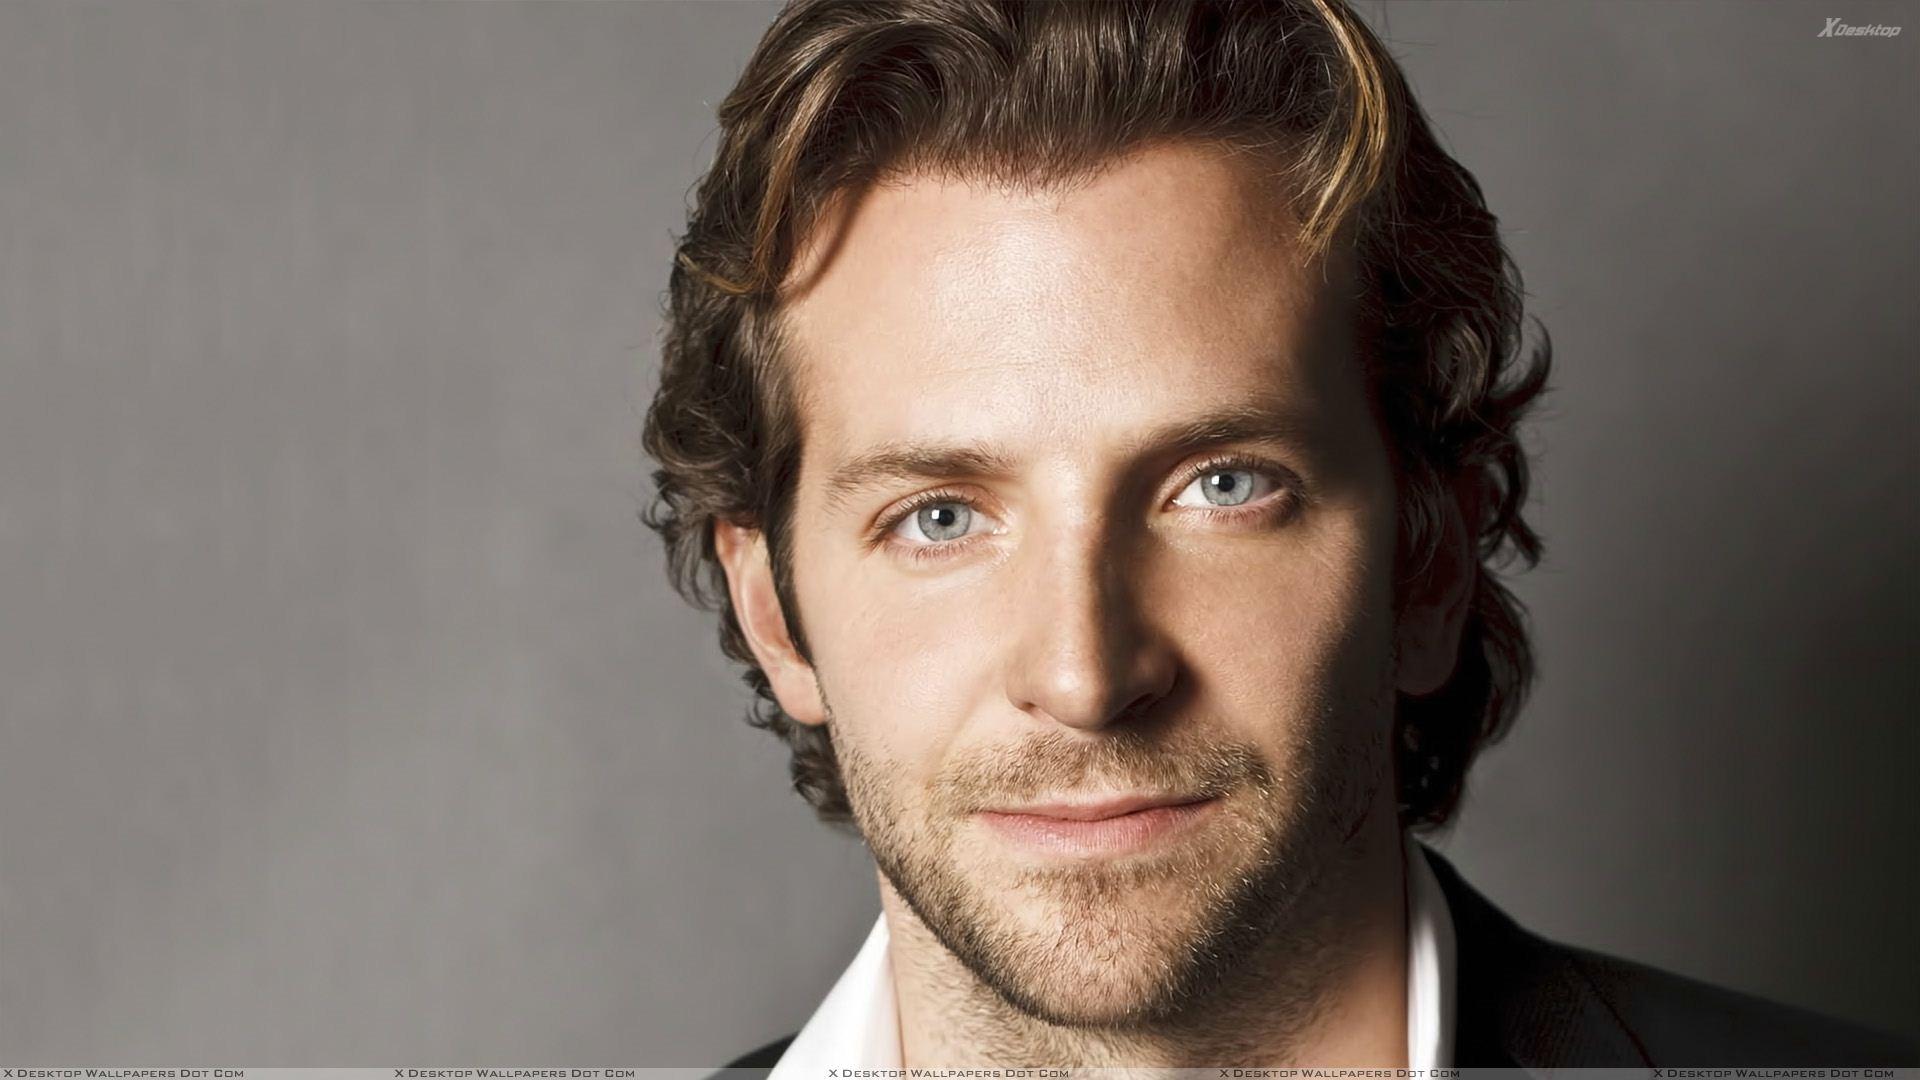 Bradley Cooper Cute Face Closeup N Grey Background Wallpaper 1920x1080